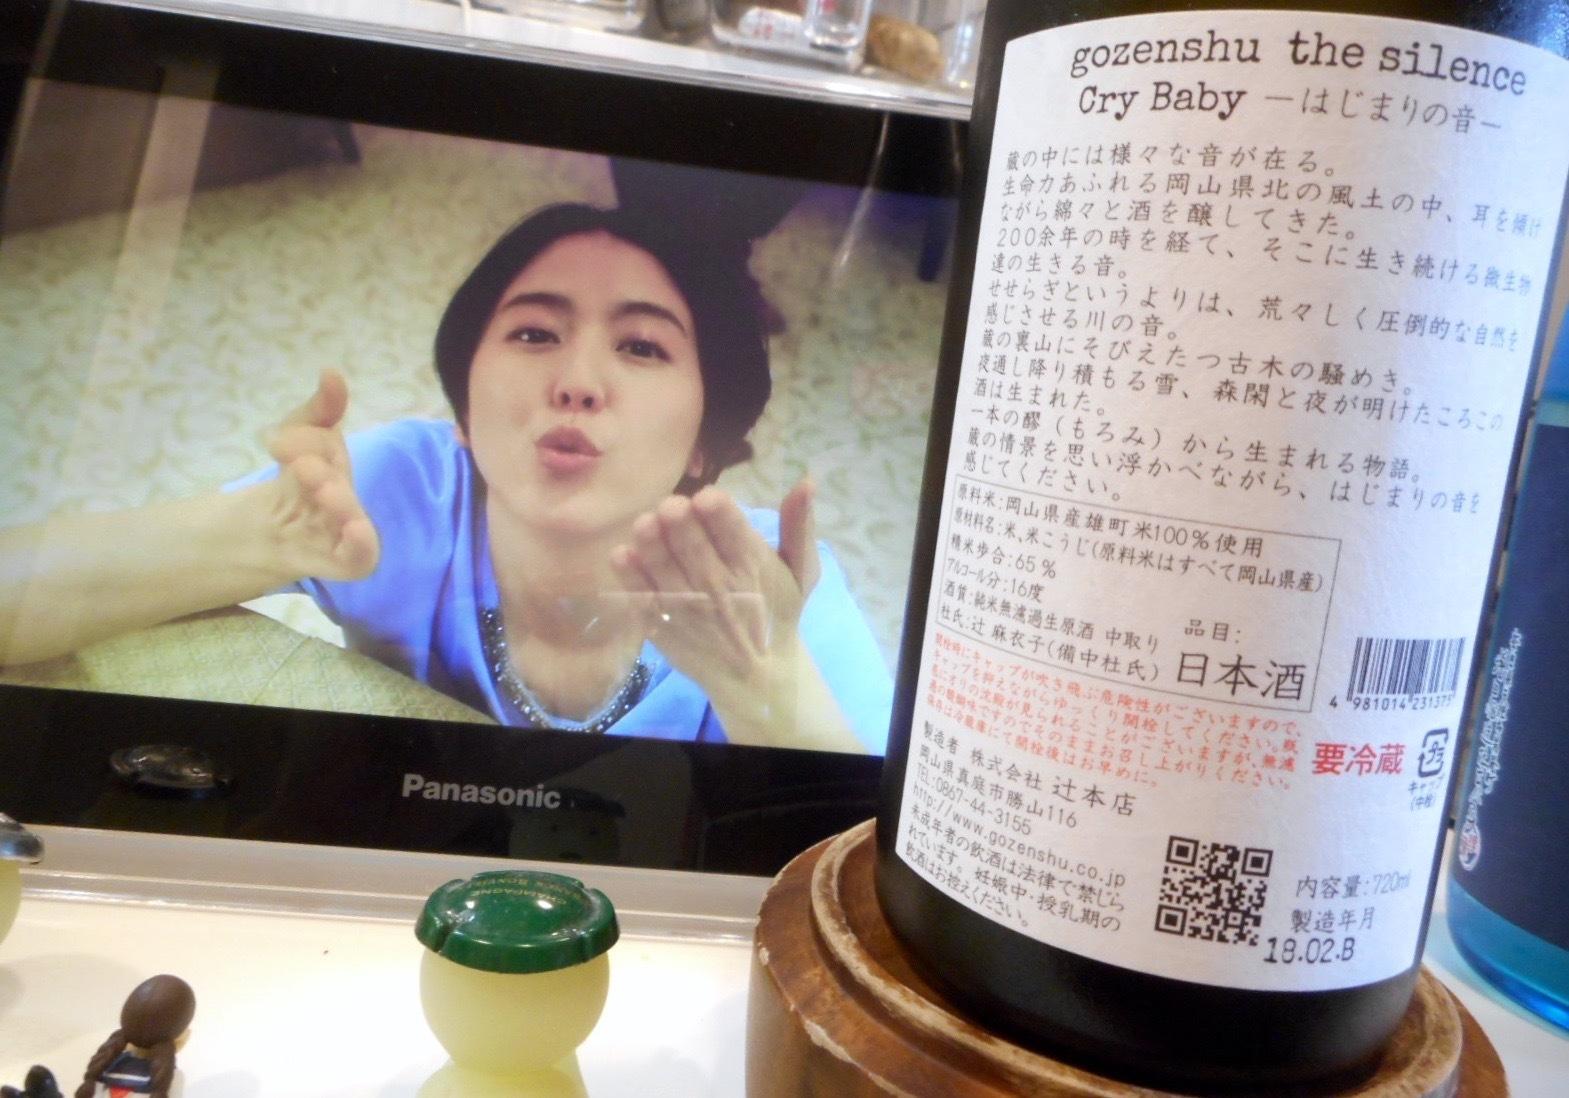 gozenshu_cry_baby29by2.jpg